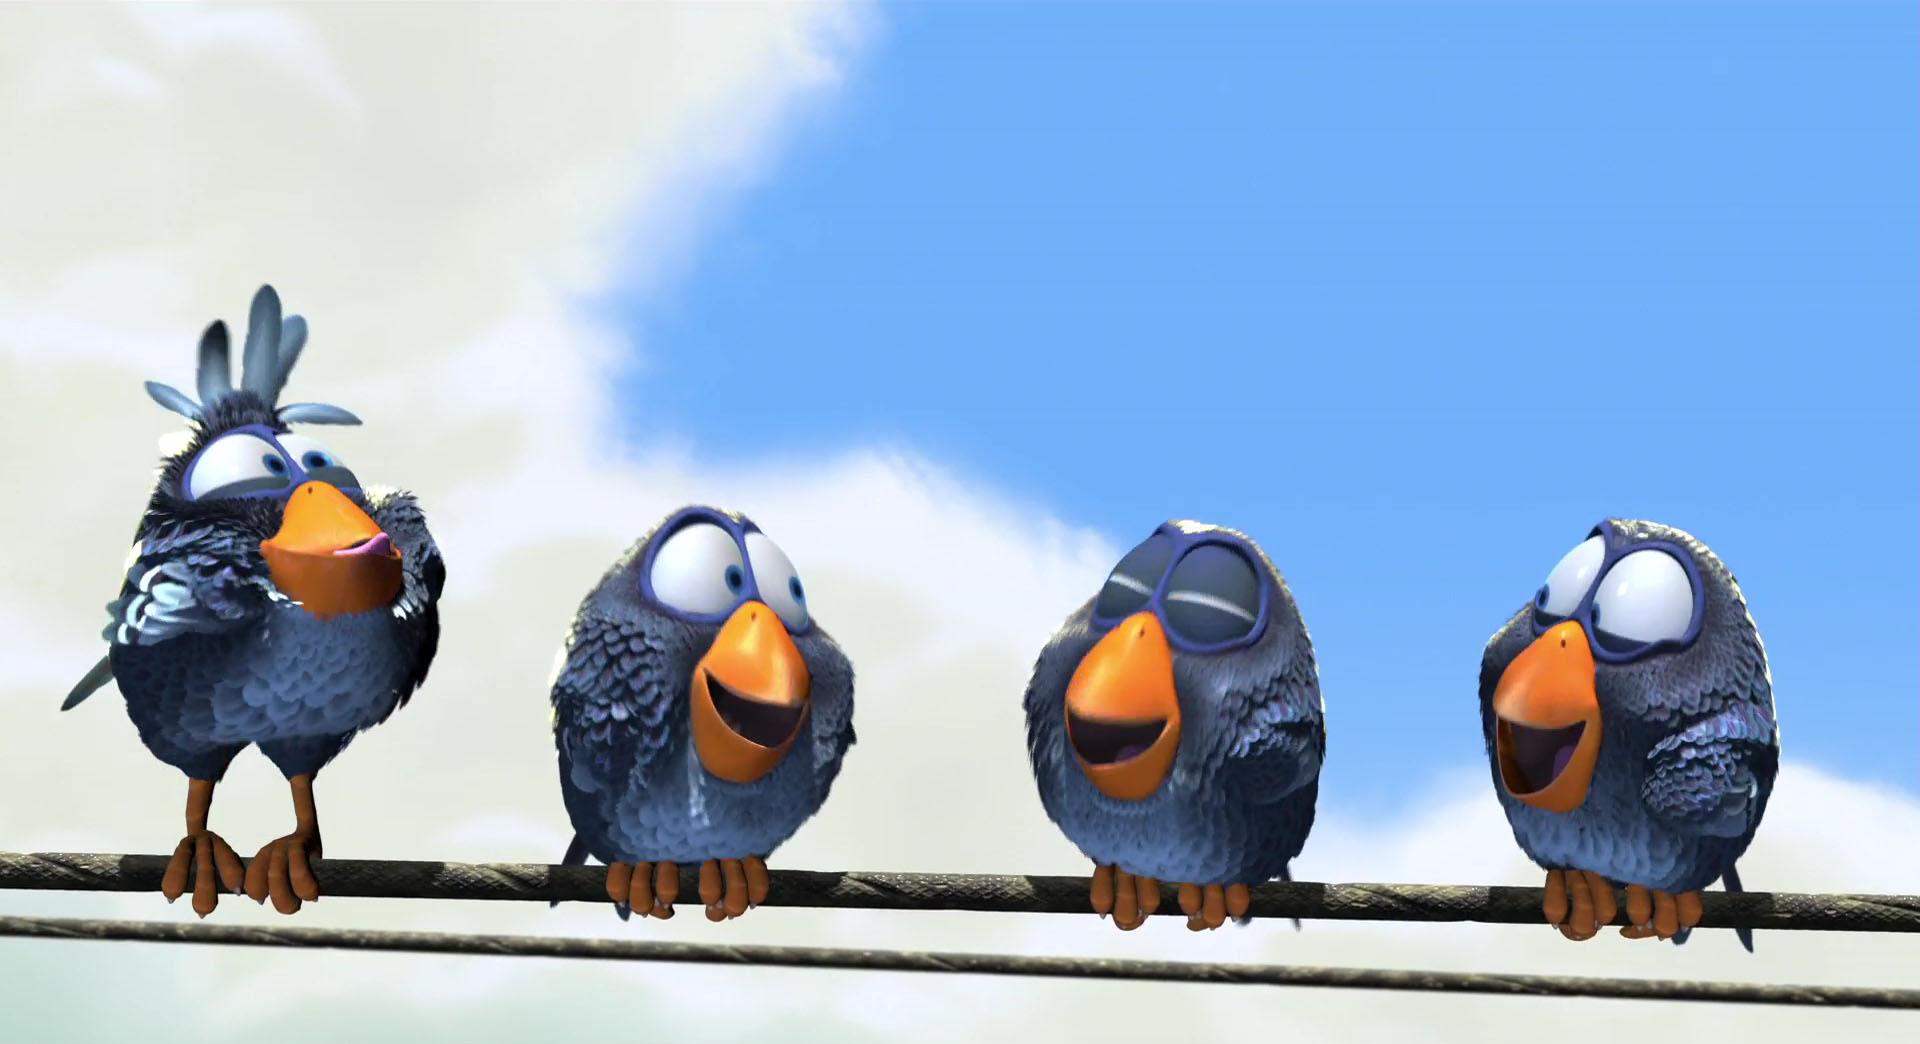 oiseau-personnage-drole-oiseau-ligne-haute-tension-03